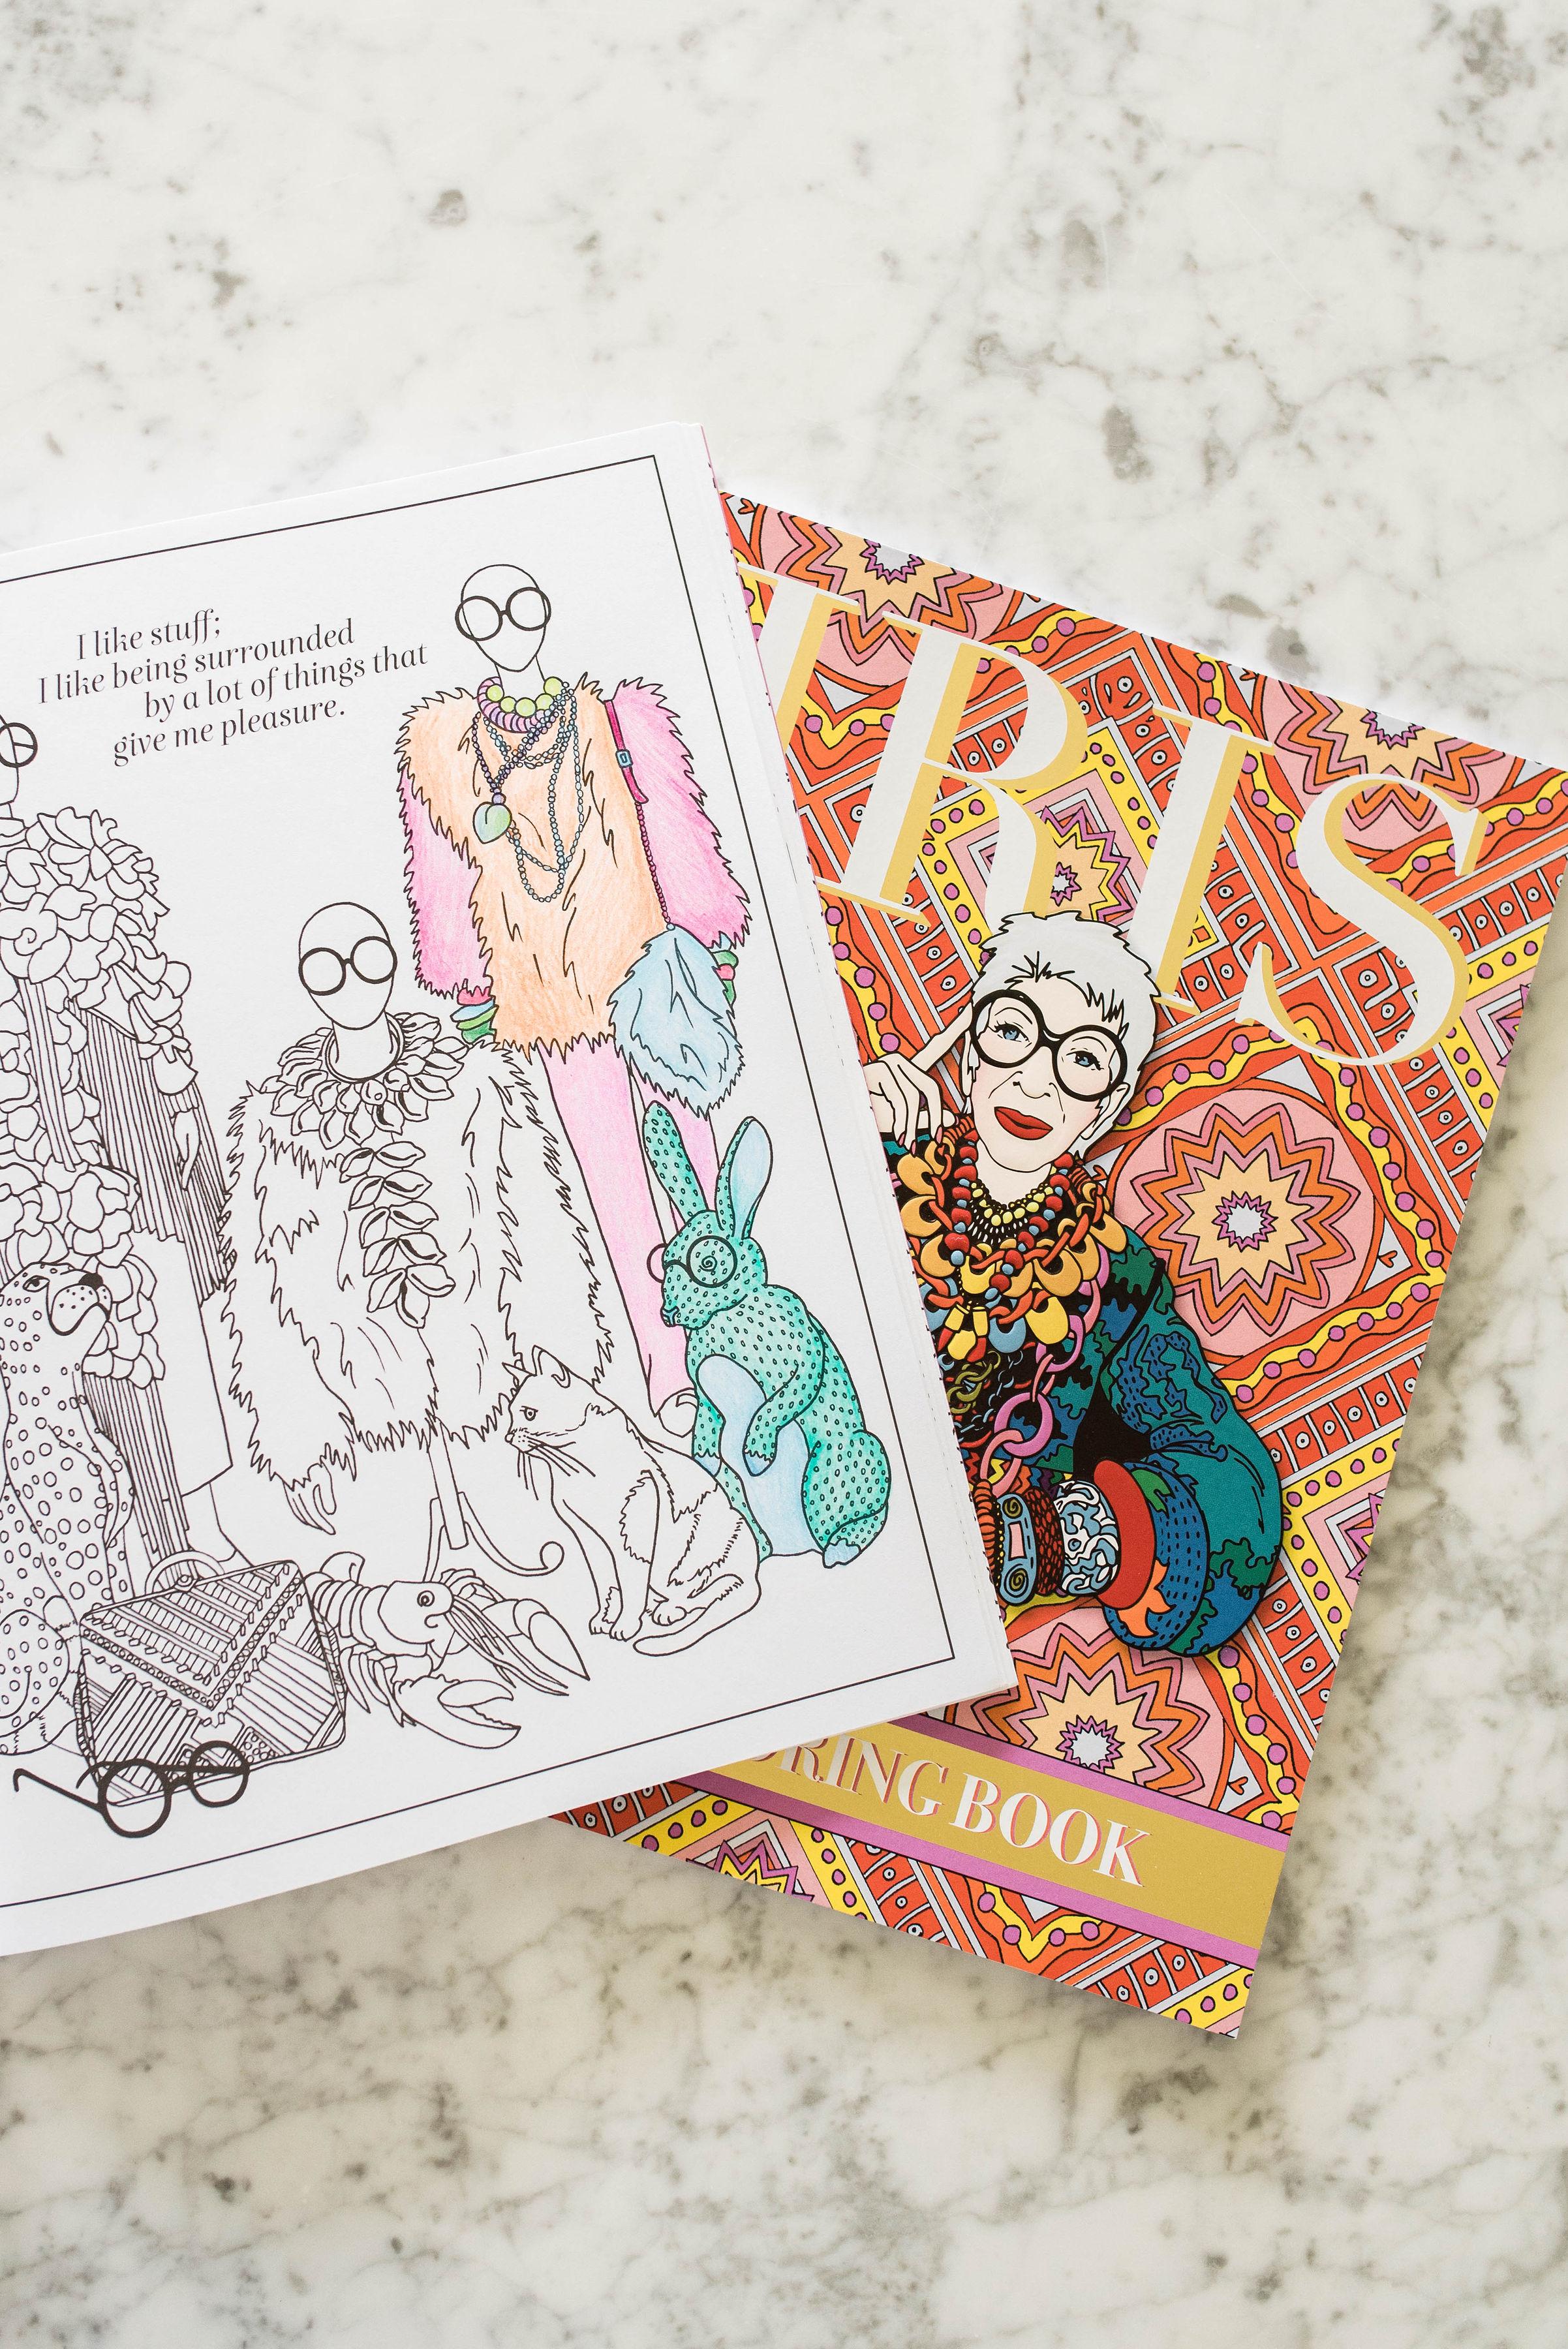 Iris Apfel Launches Autobiographical Coloring Book